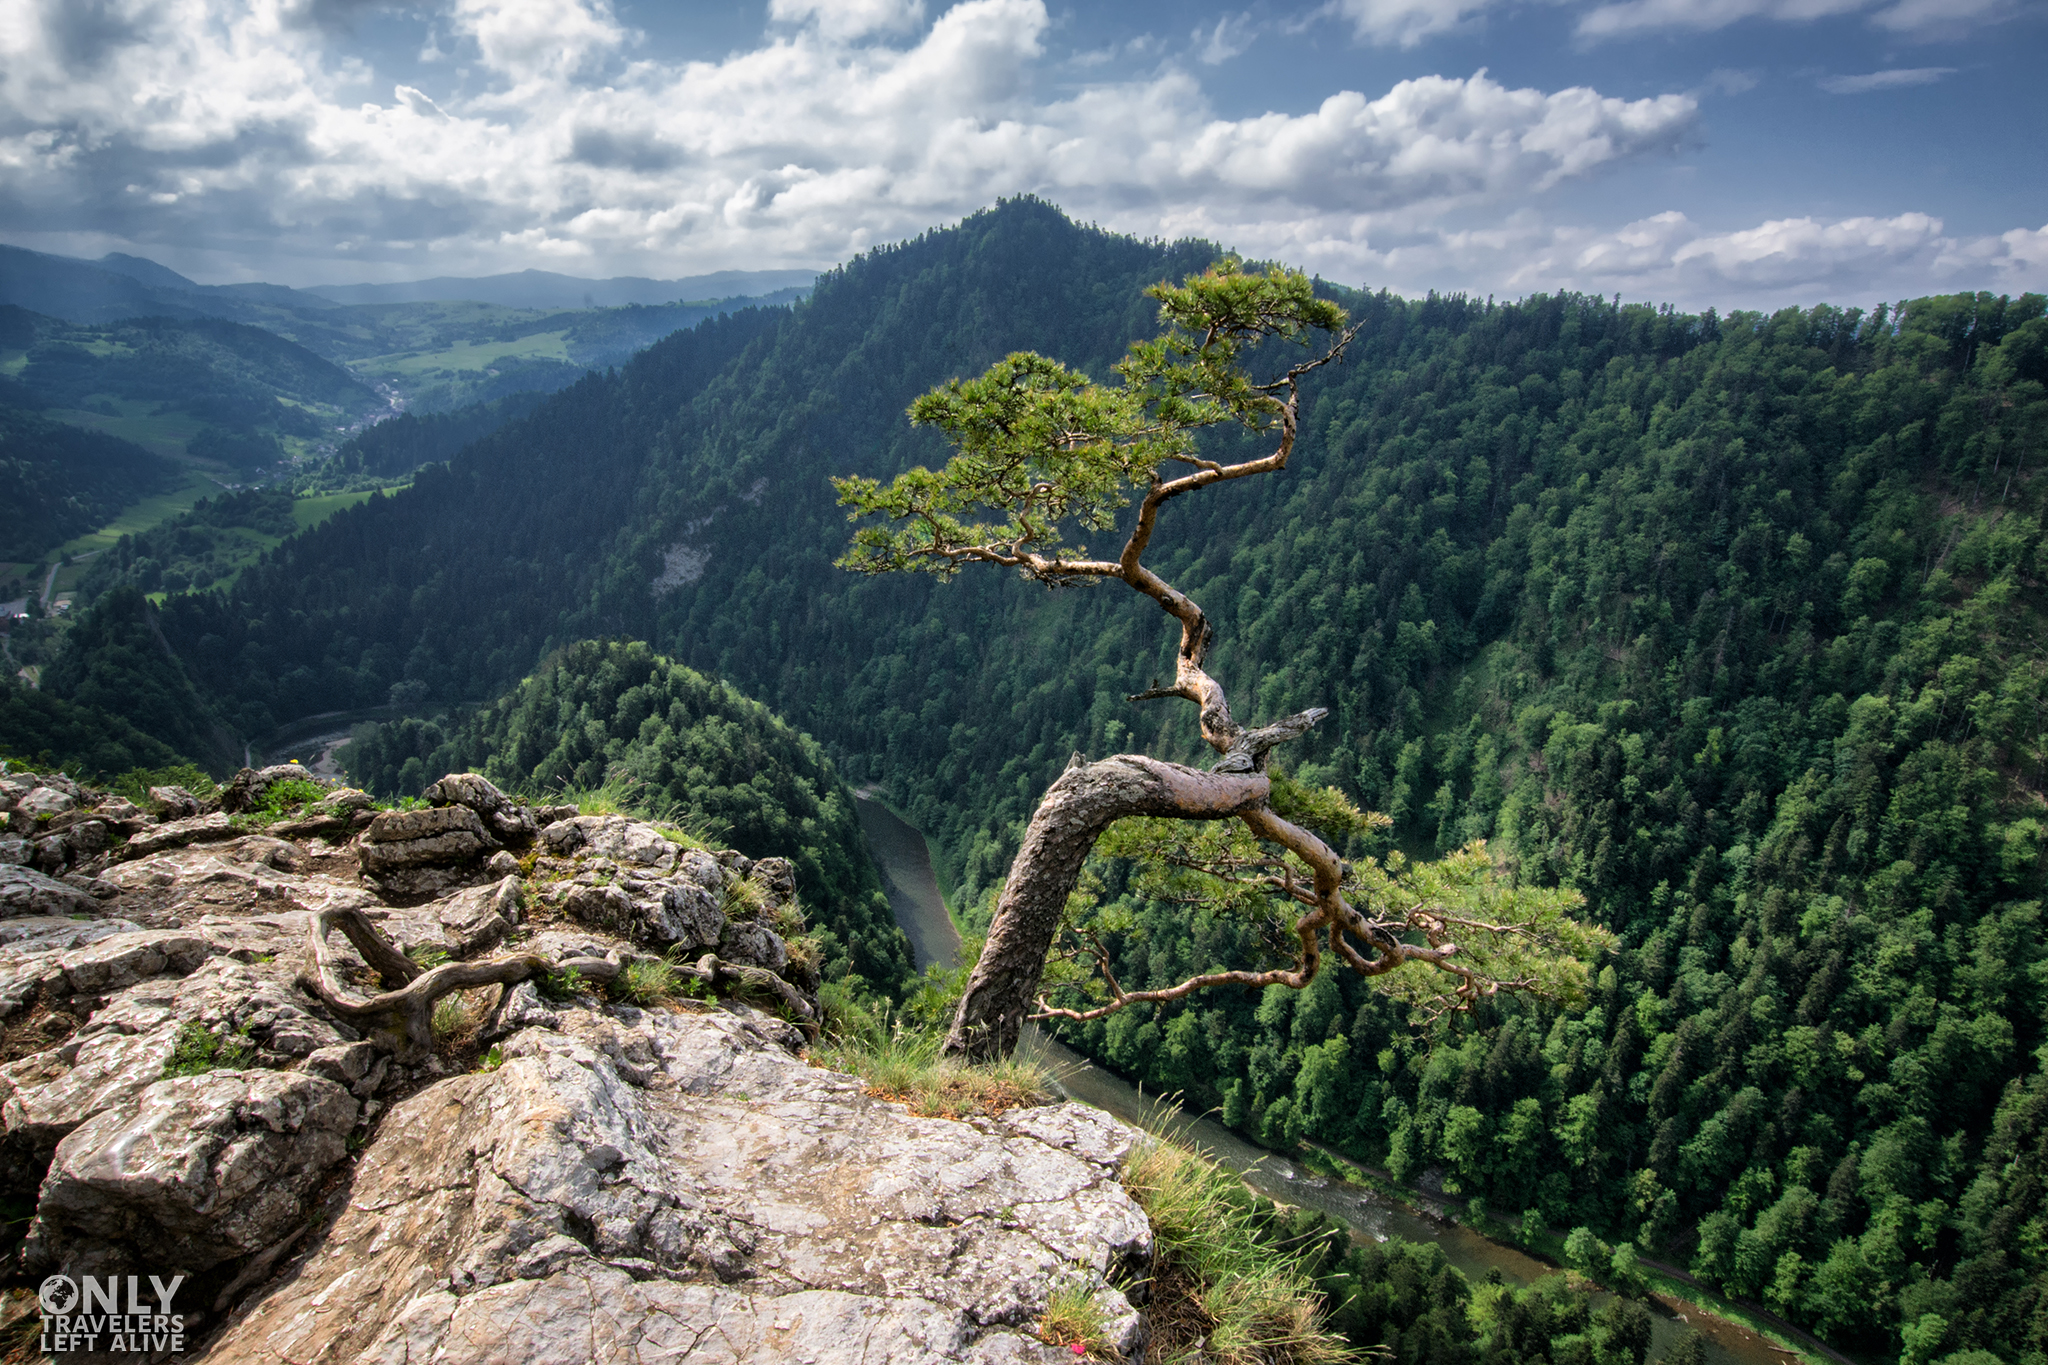 Sokolica only travelers left alive